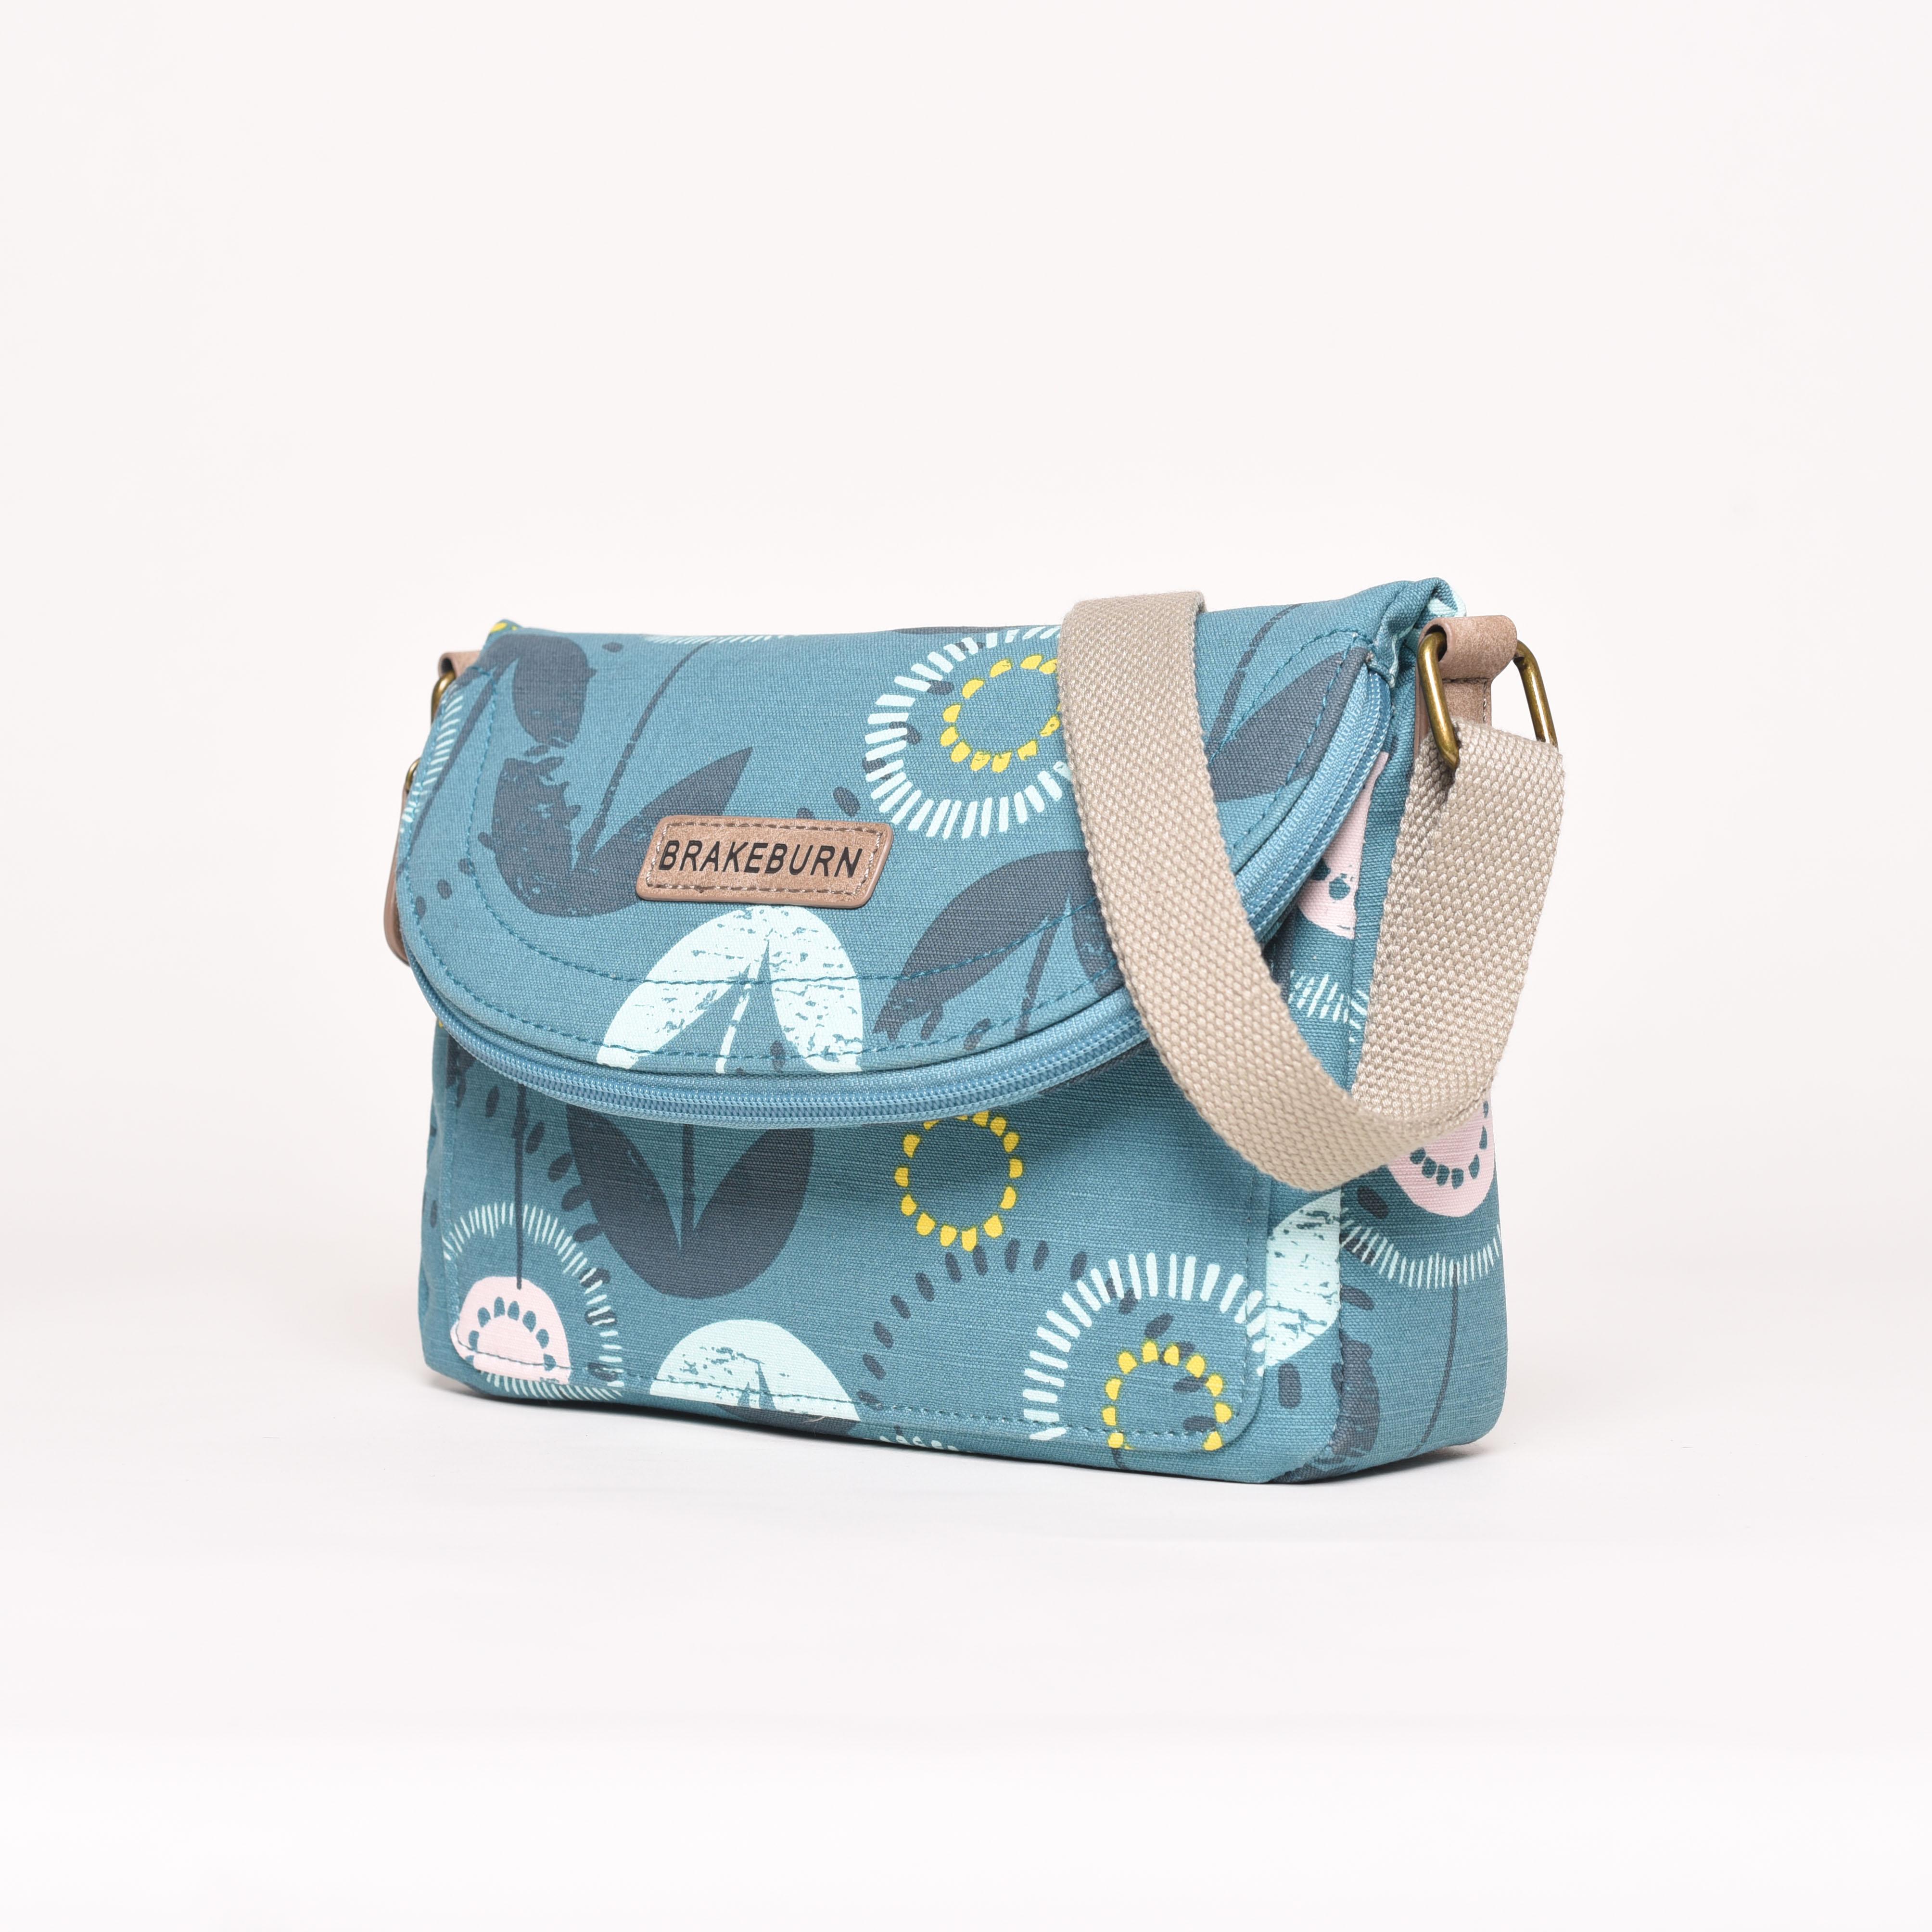 Brakeburn Olivia Roo Pouch bag